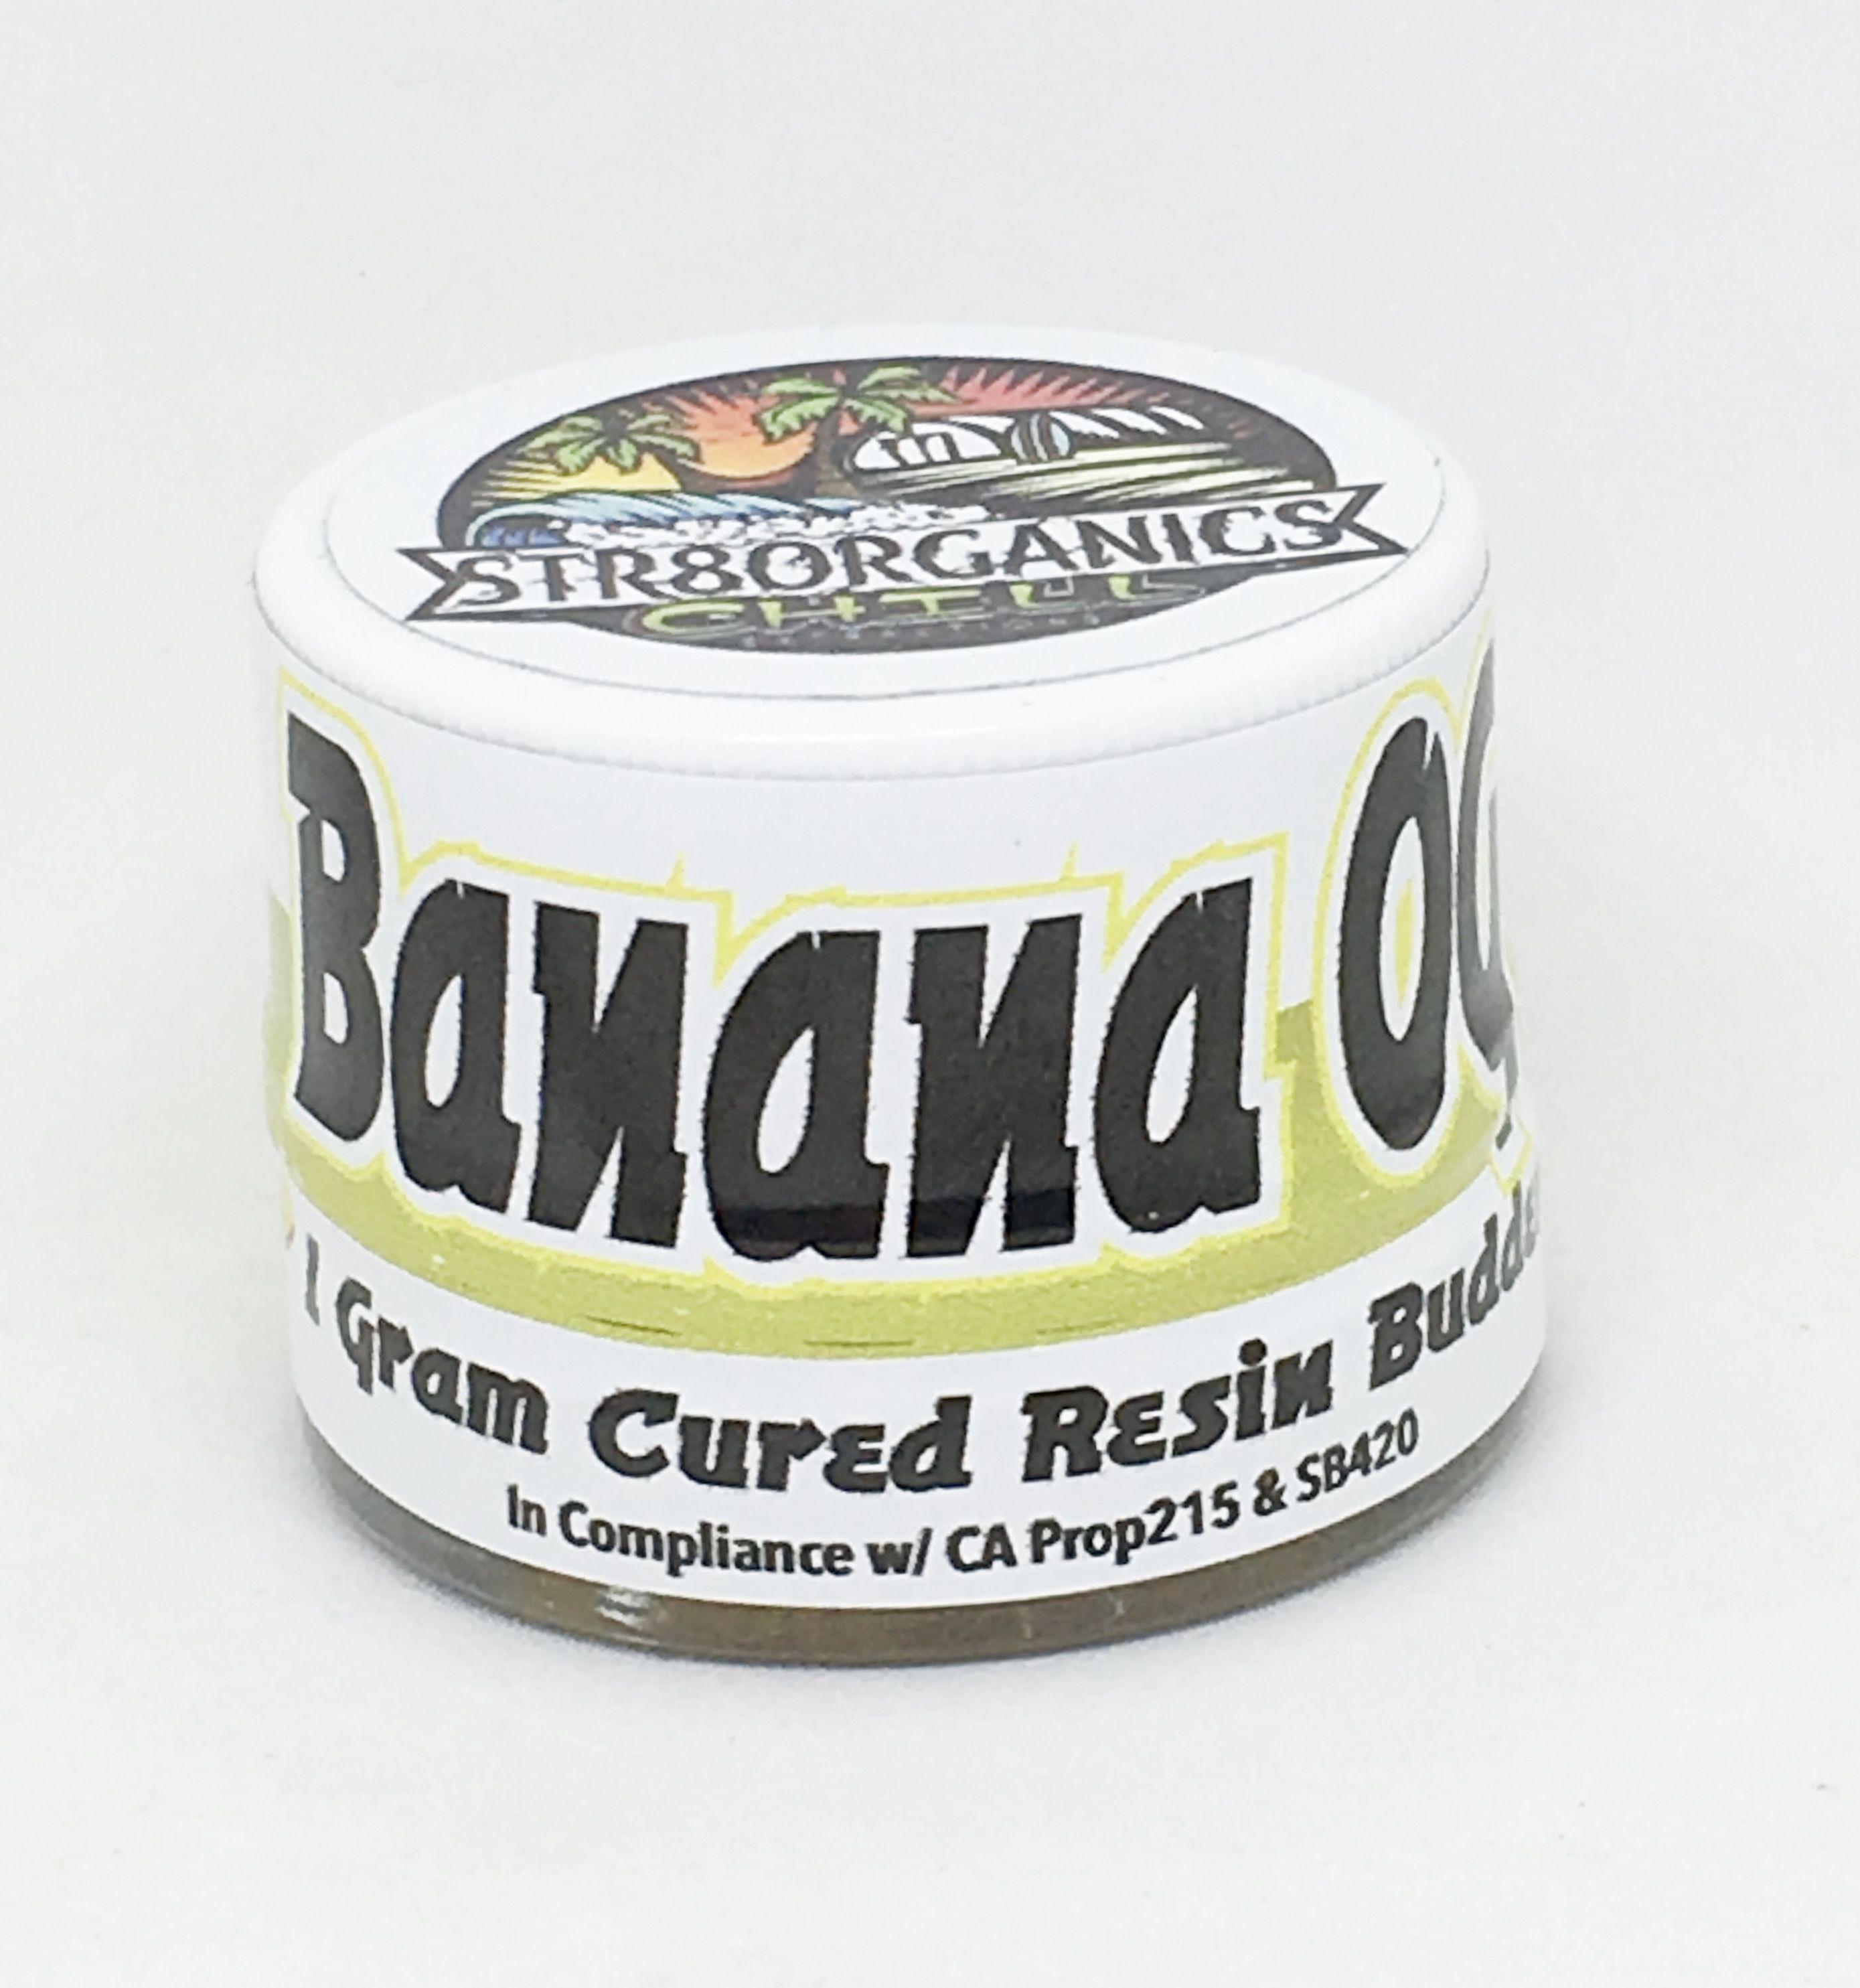 Banana OG Cured Resin Budder- STR8ORGANICS